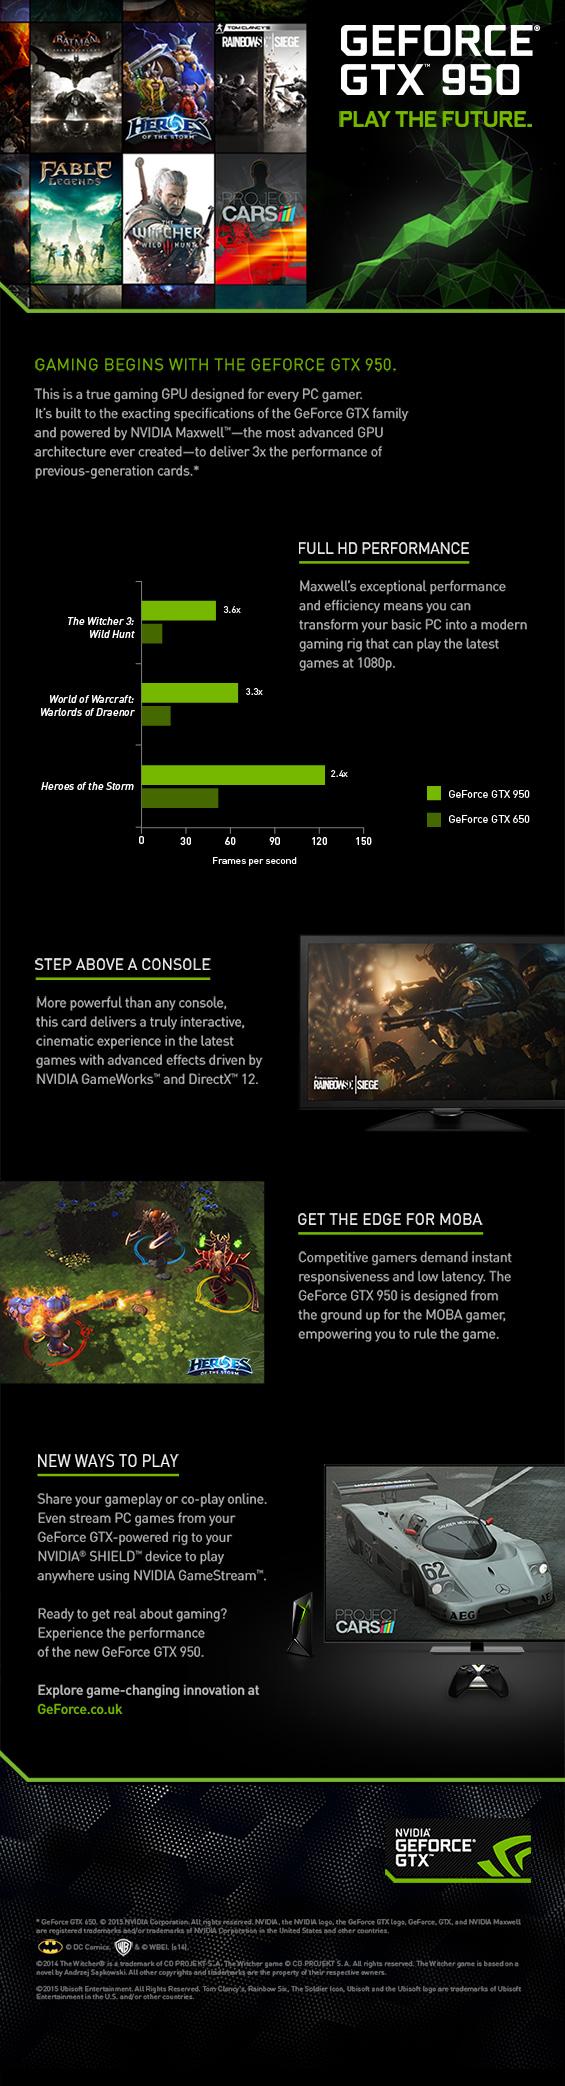 Nvidia GTX 950 2GB Information